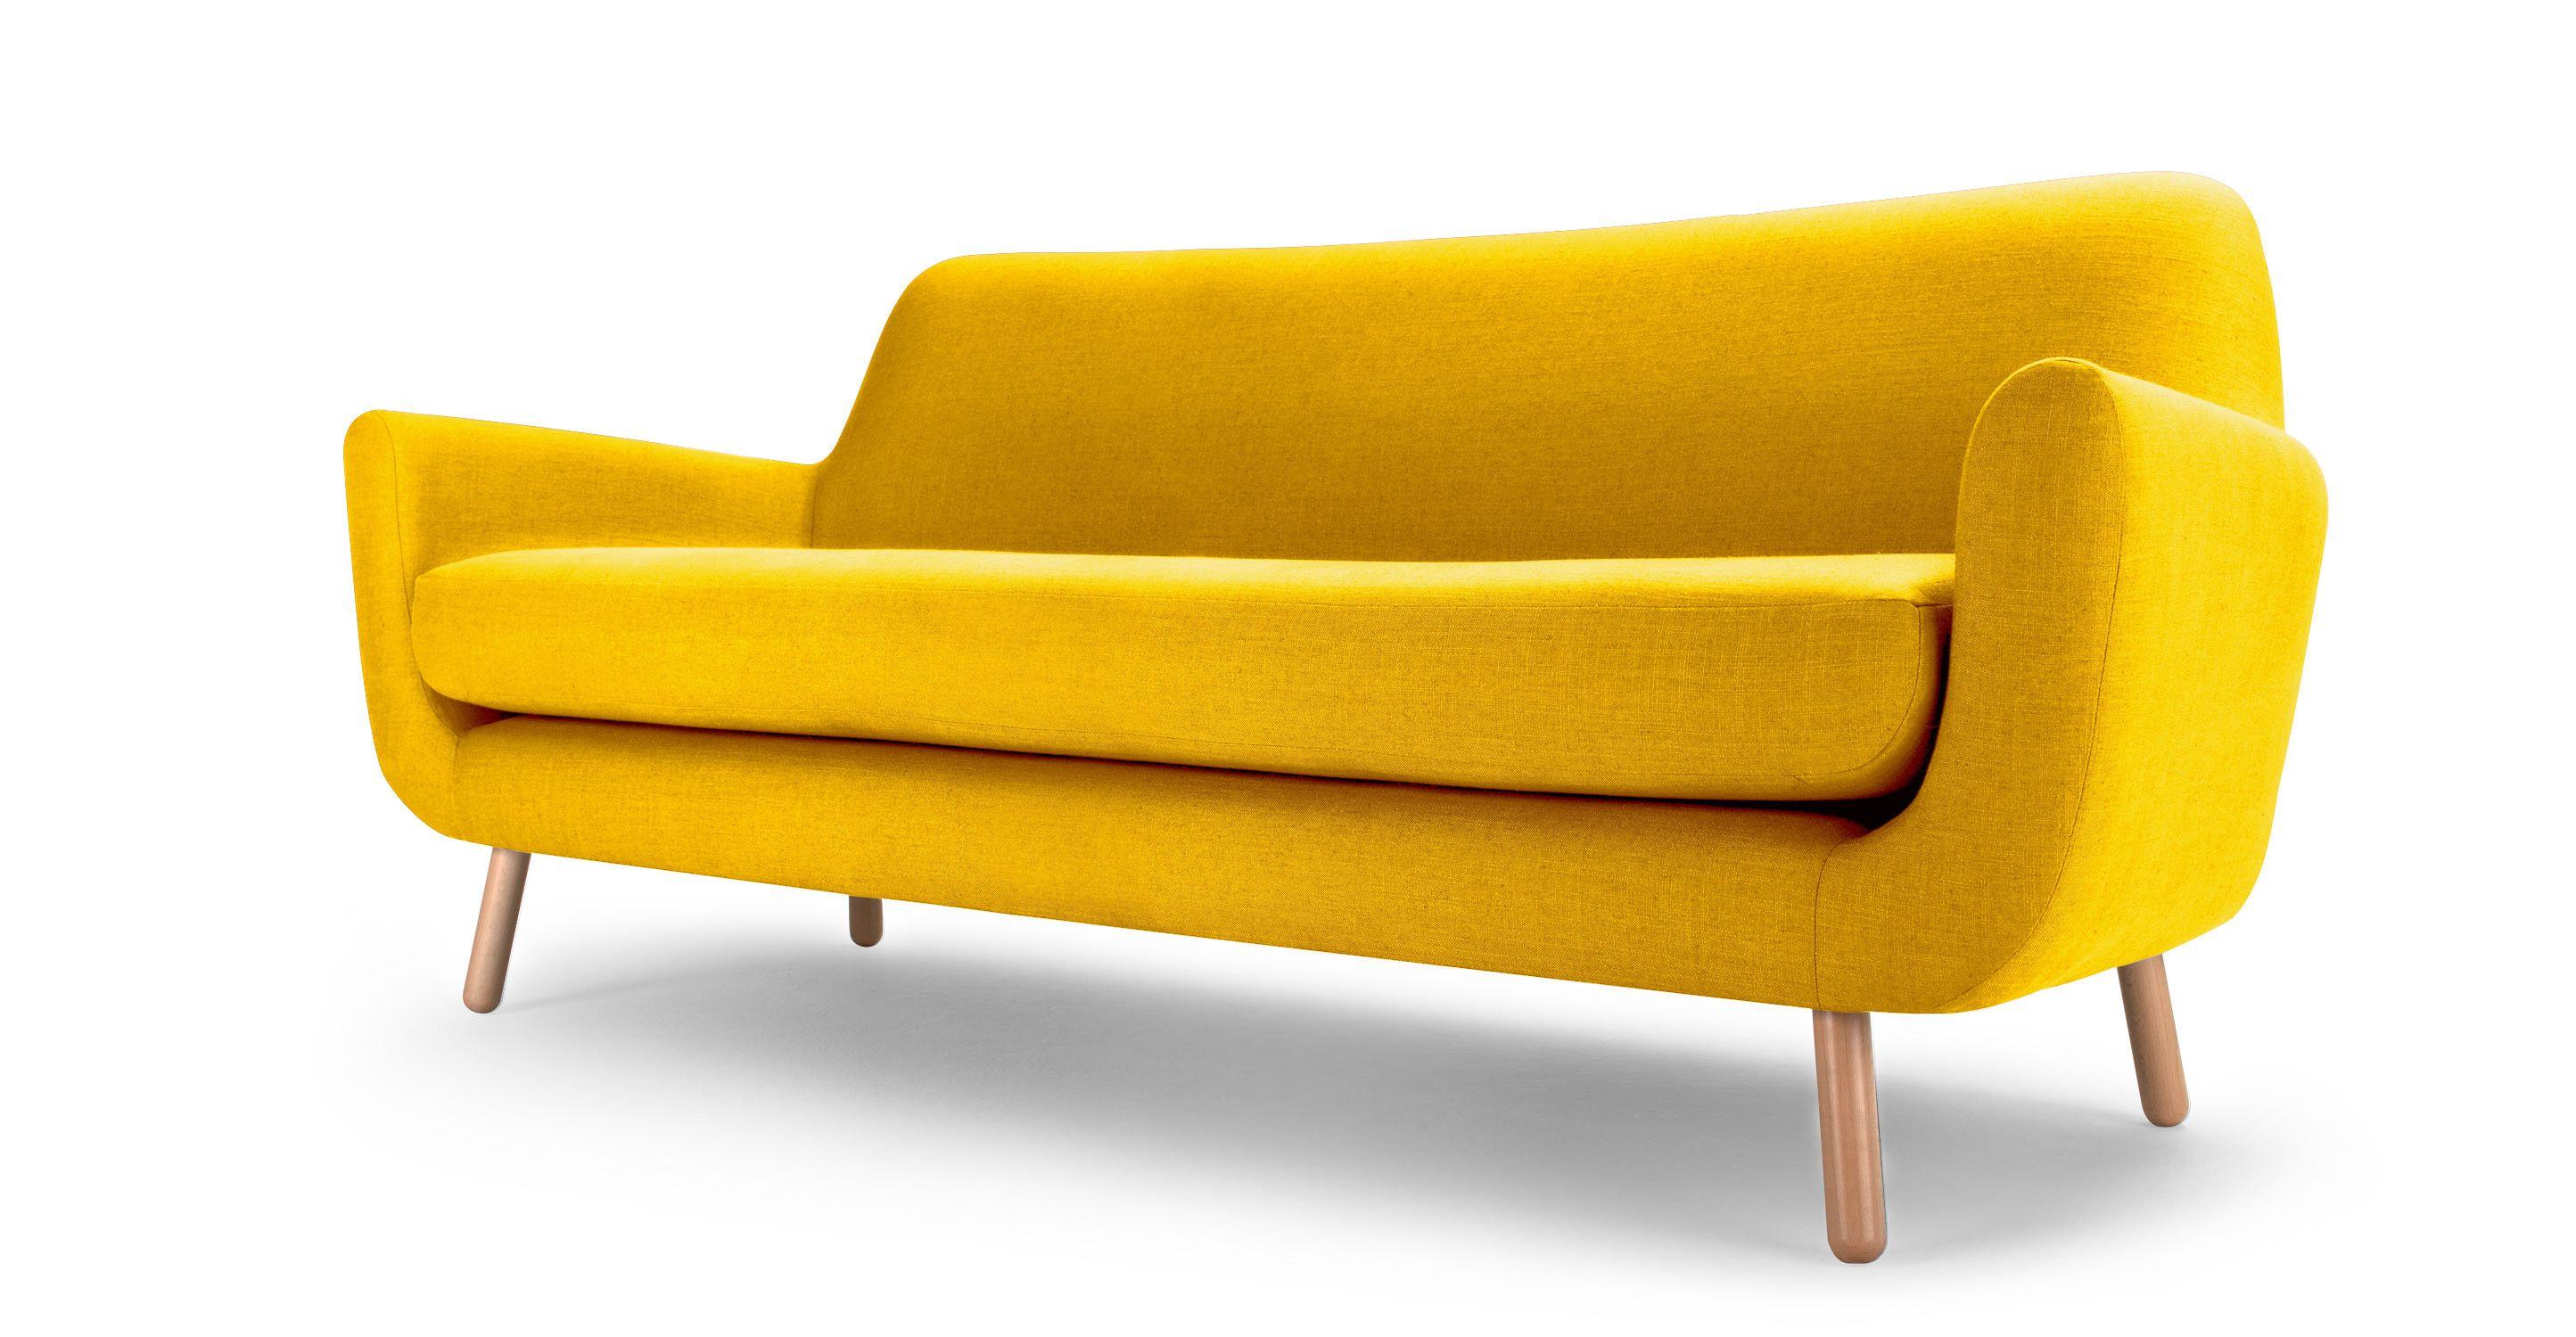 Yellow Sofa 3 Seater Sofa Small Sofa Designs Yellow Sofa